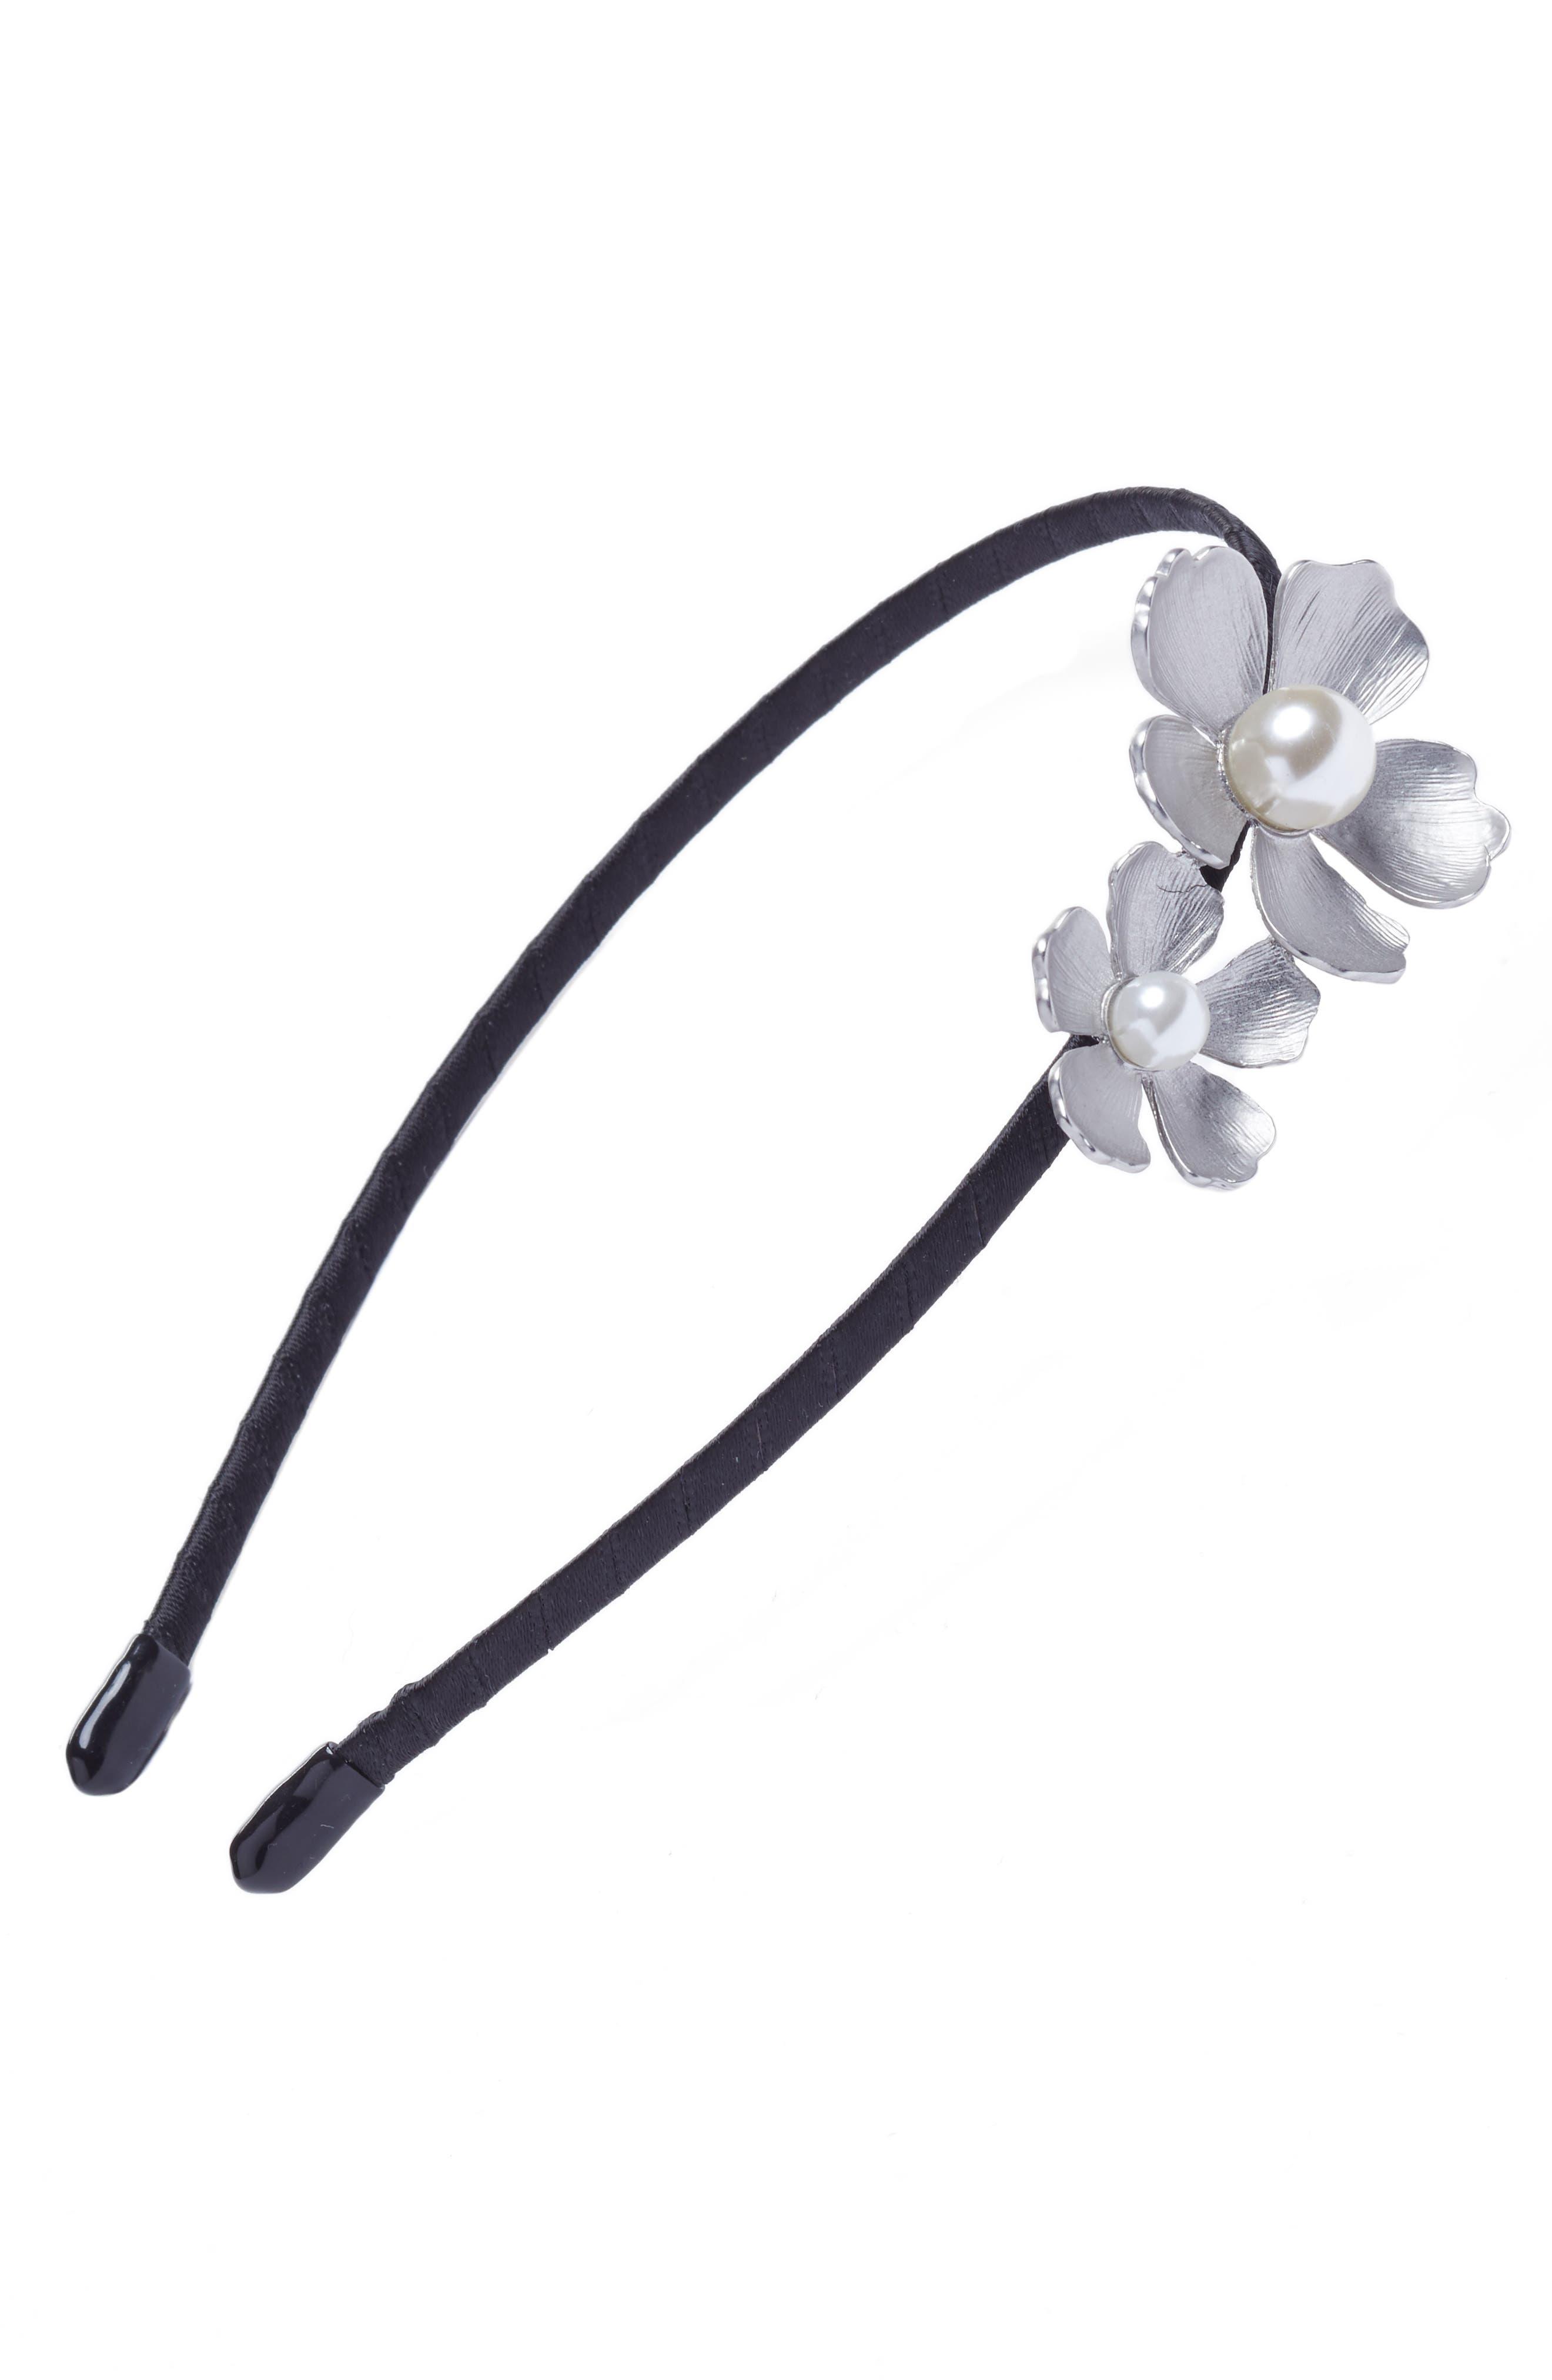 Double Flower Headband,                         Main,                         color, Silver/Black